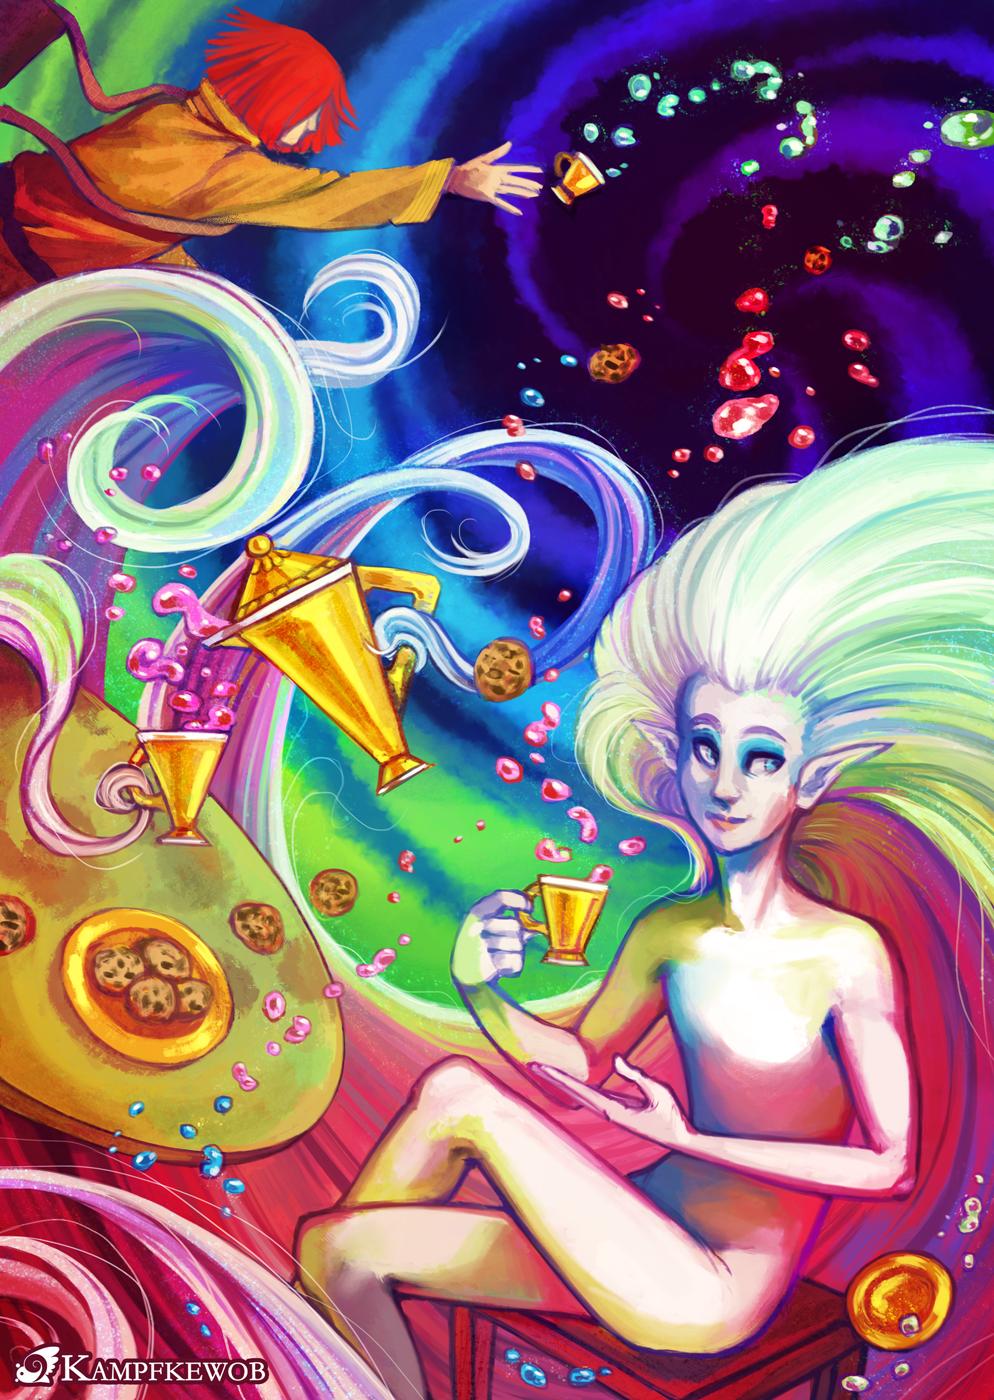 Tea Party by Kampfkewob